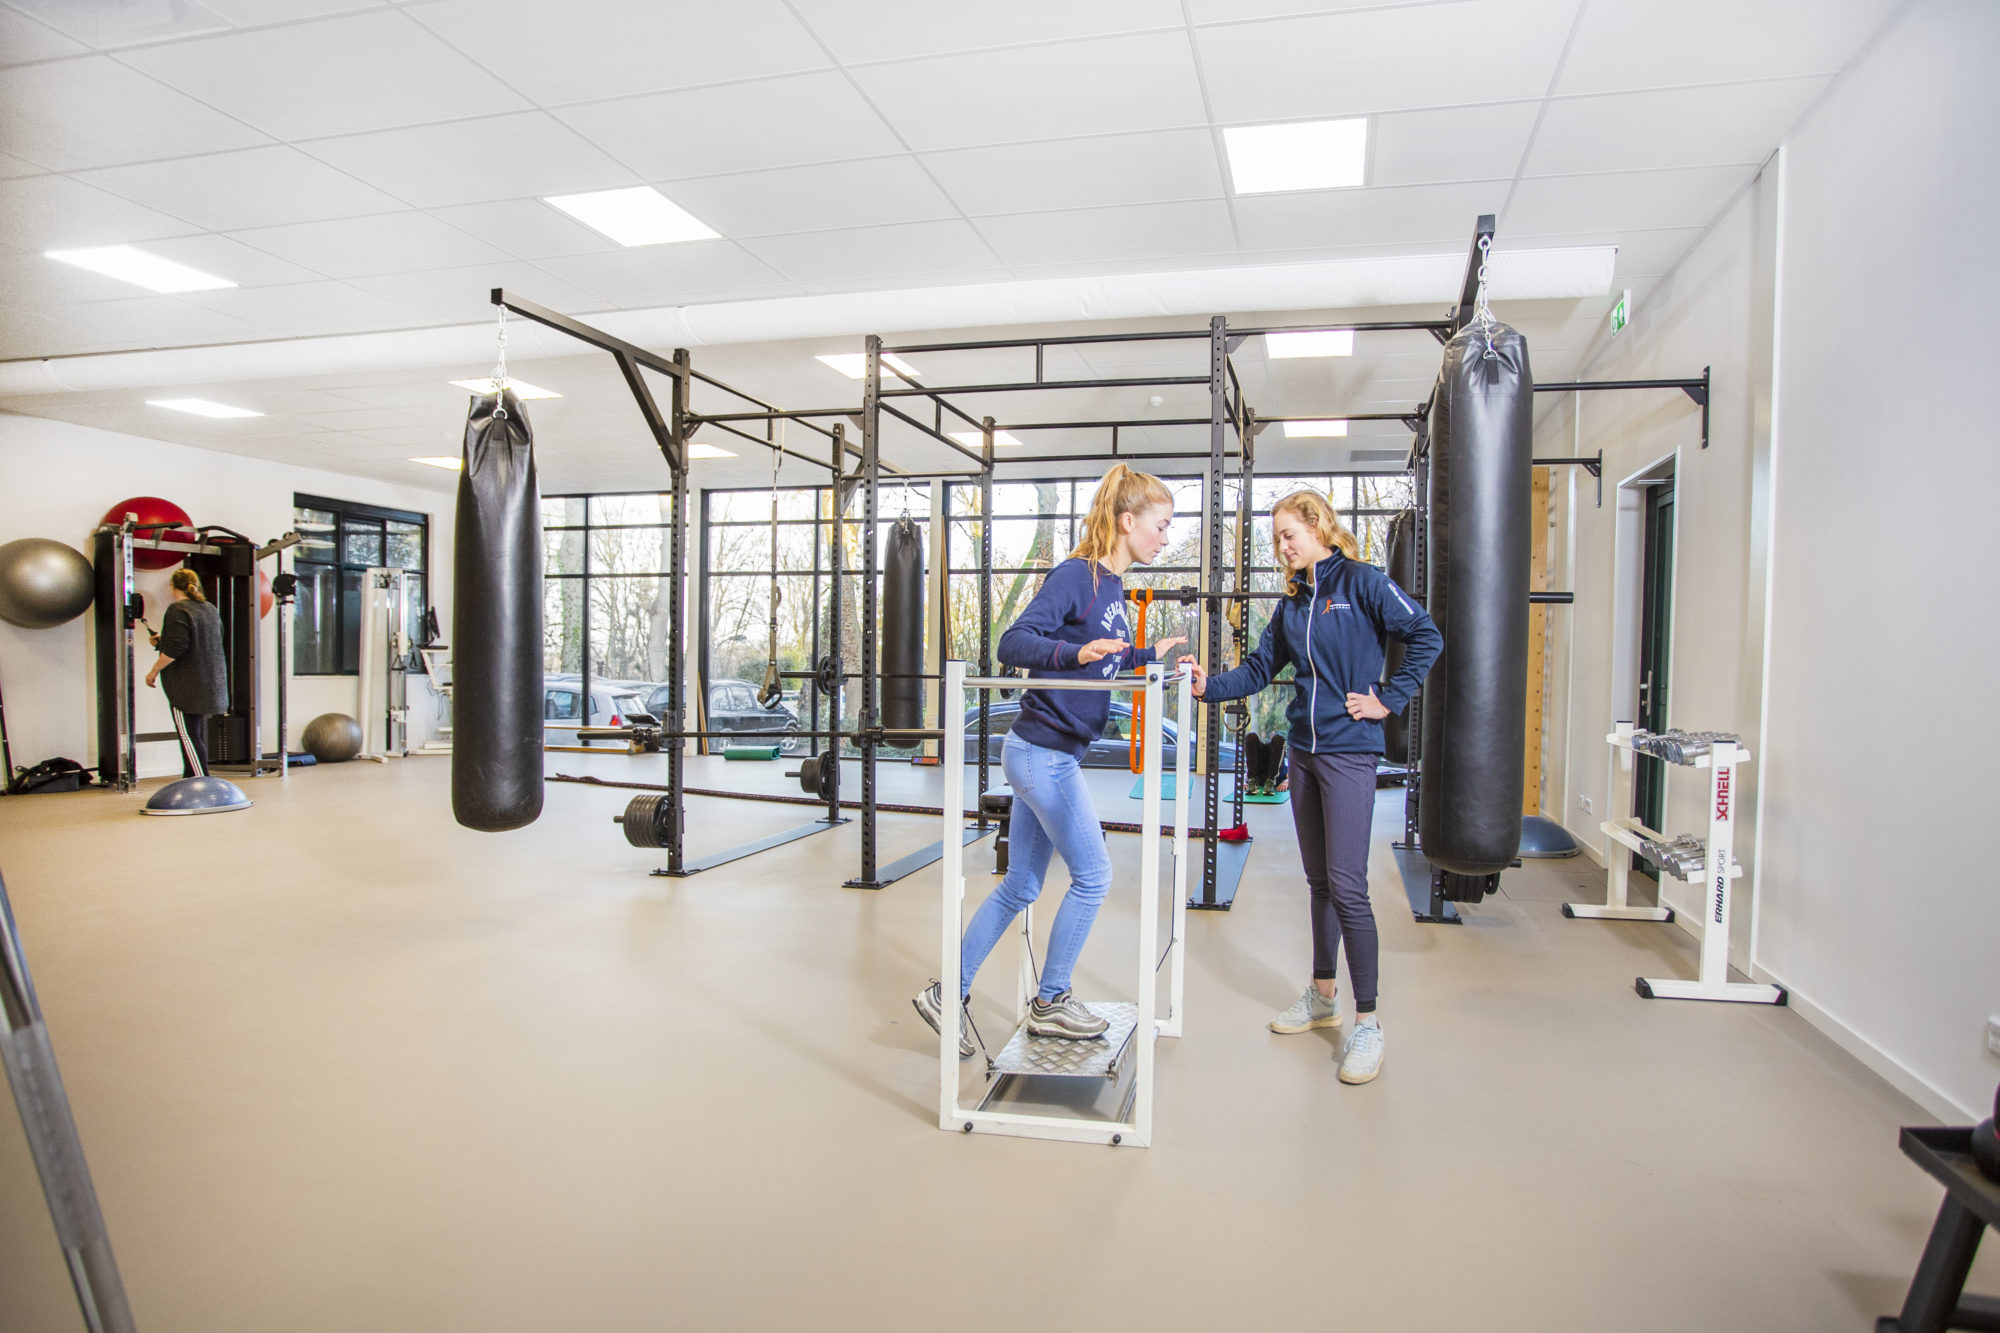 sportfysiotherapie bij fysiotherapie Nijmegen van sport medisch centrum papendal